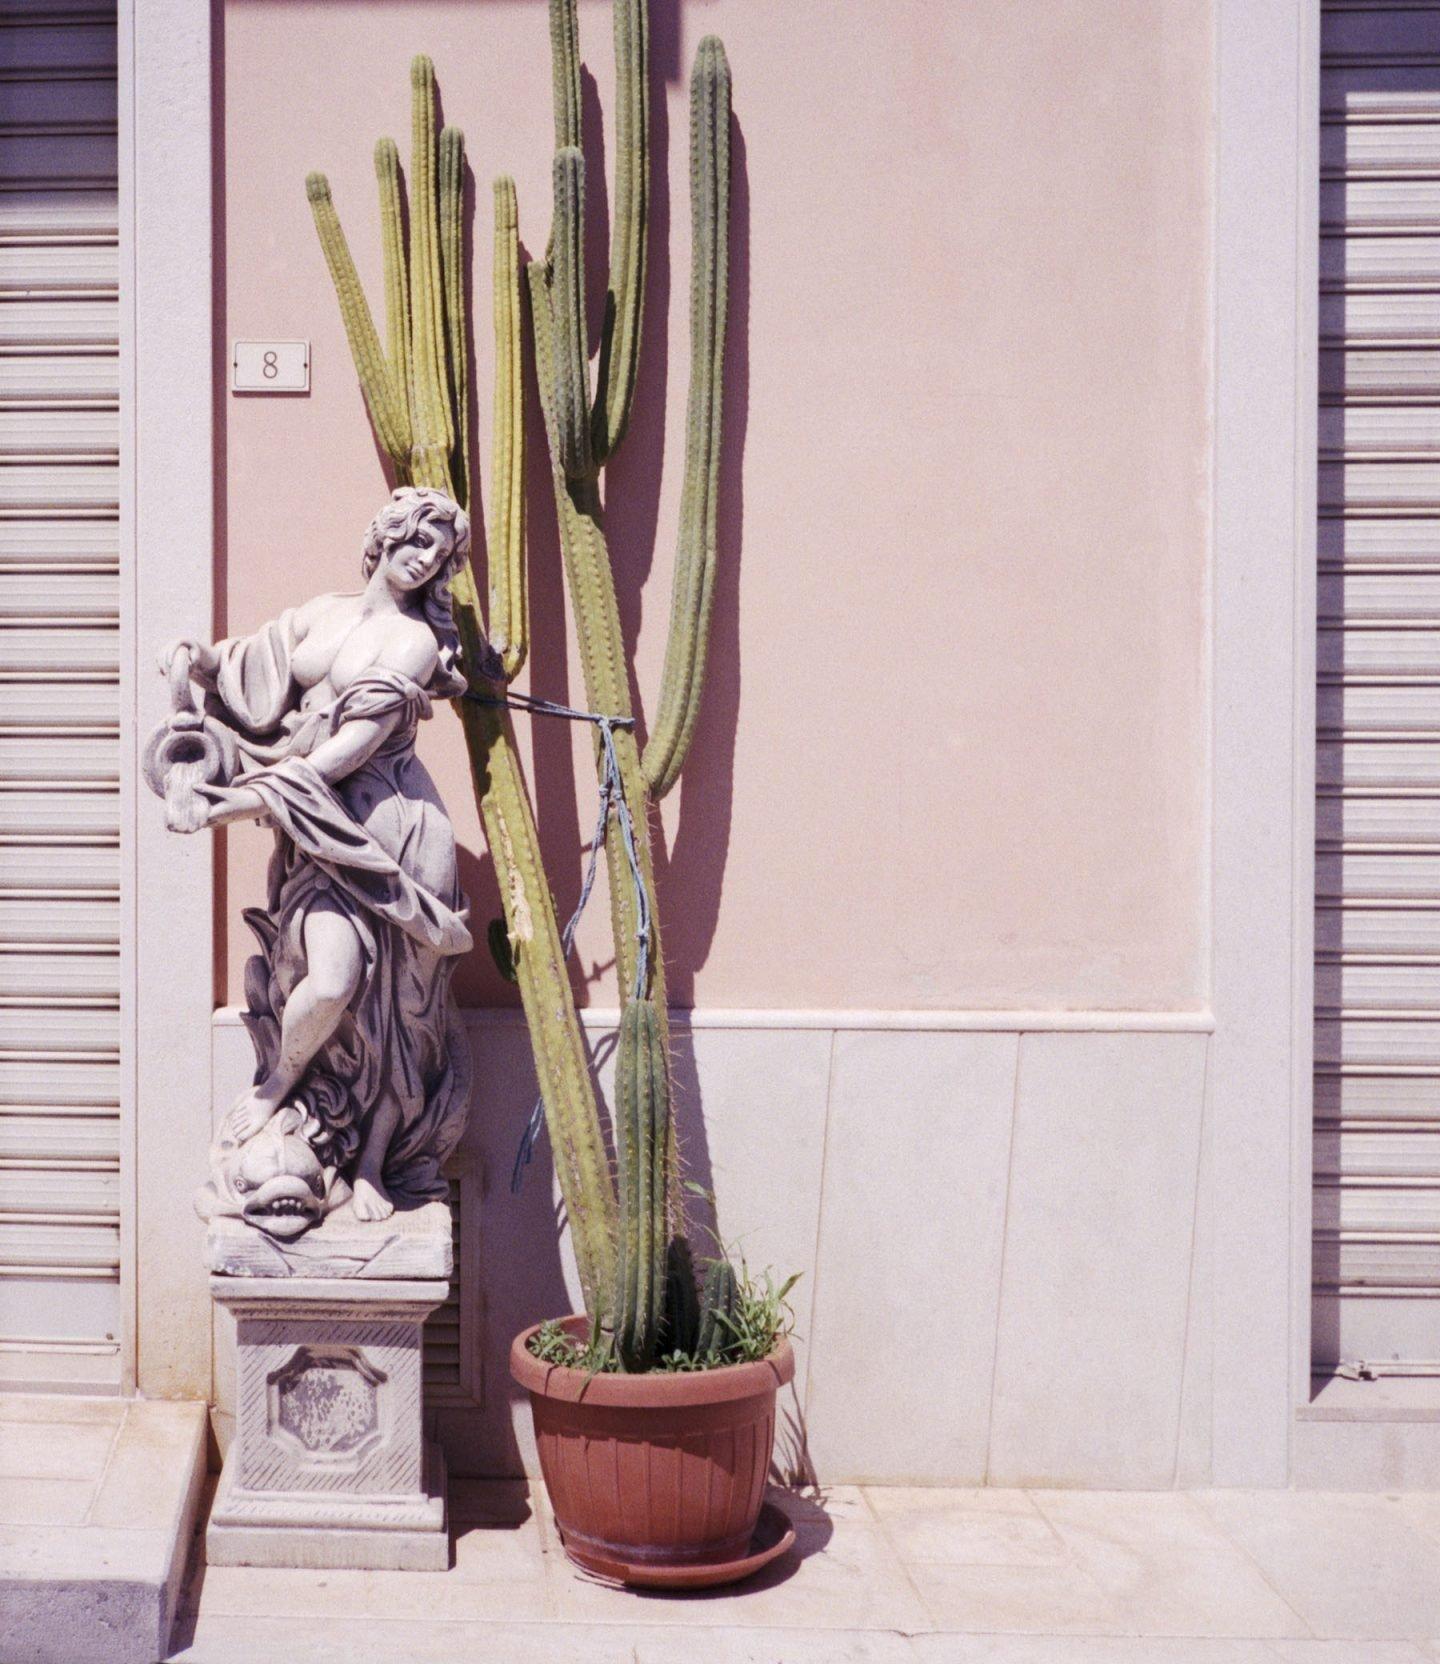 iGNANT-Stefan-Giftthaler-Statues-16